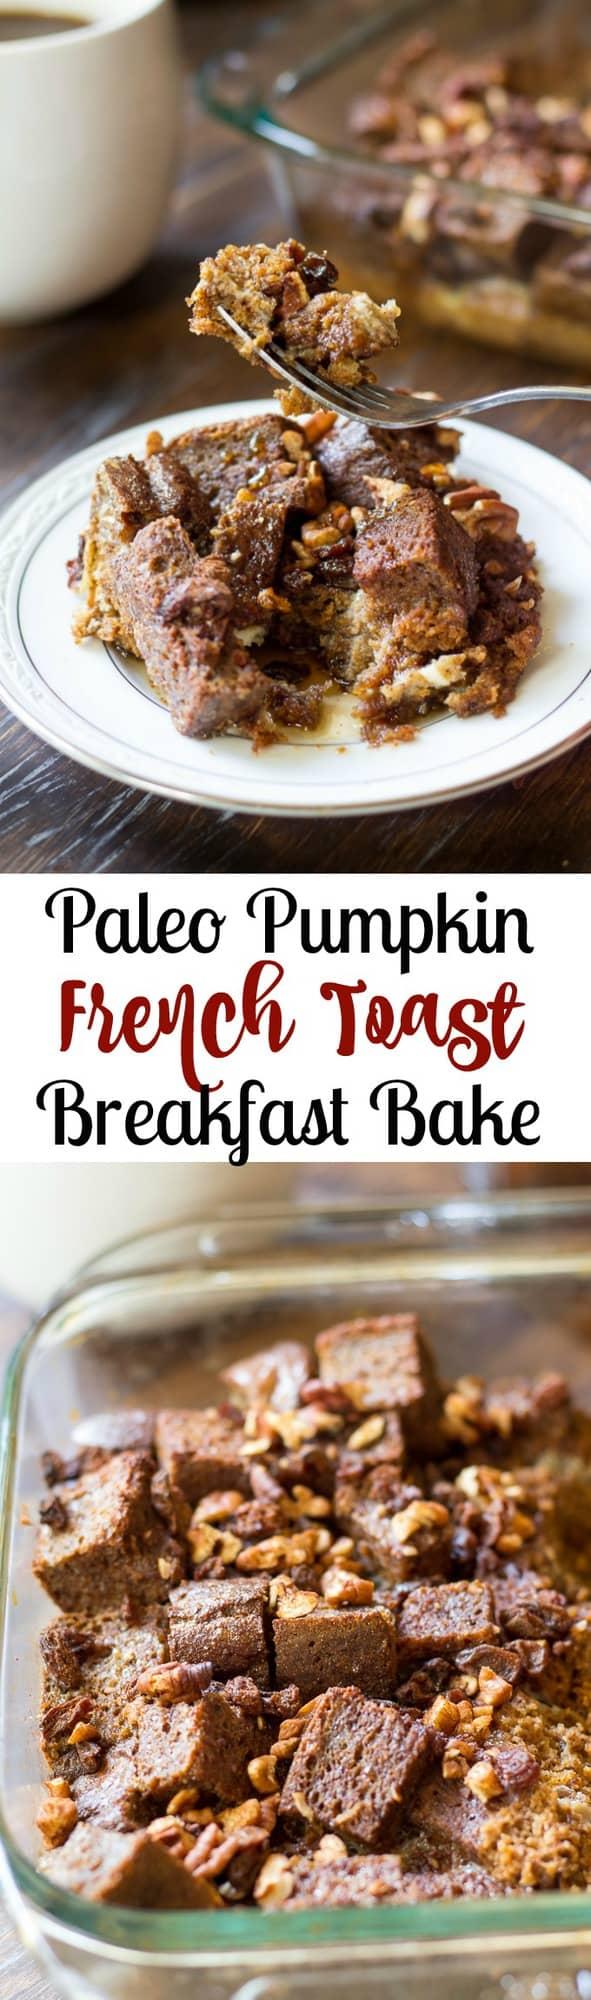 paleo pumpkin french toast breakfast bake